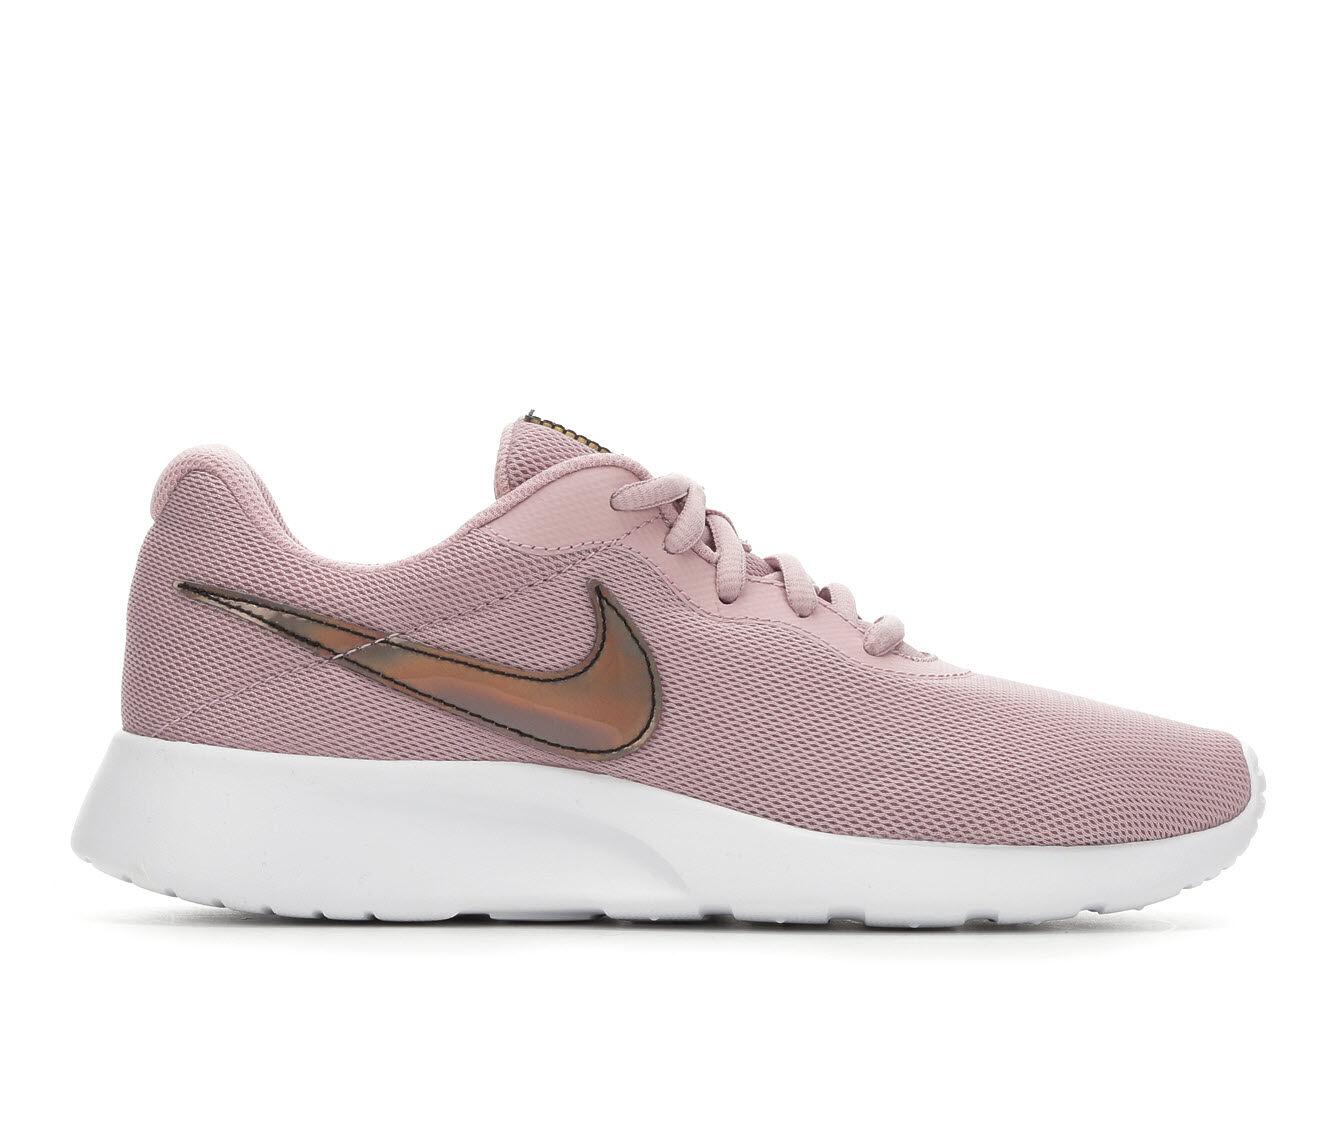 uk shoes_kd4426